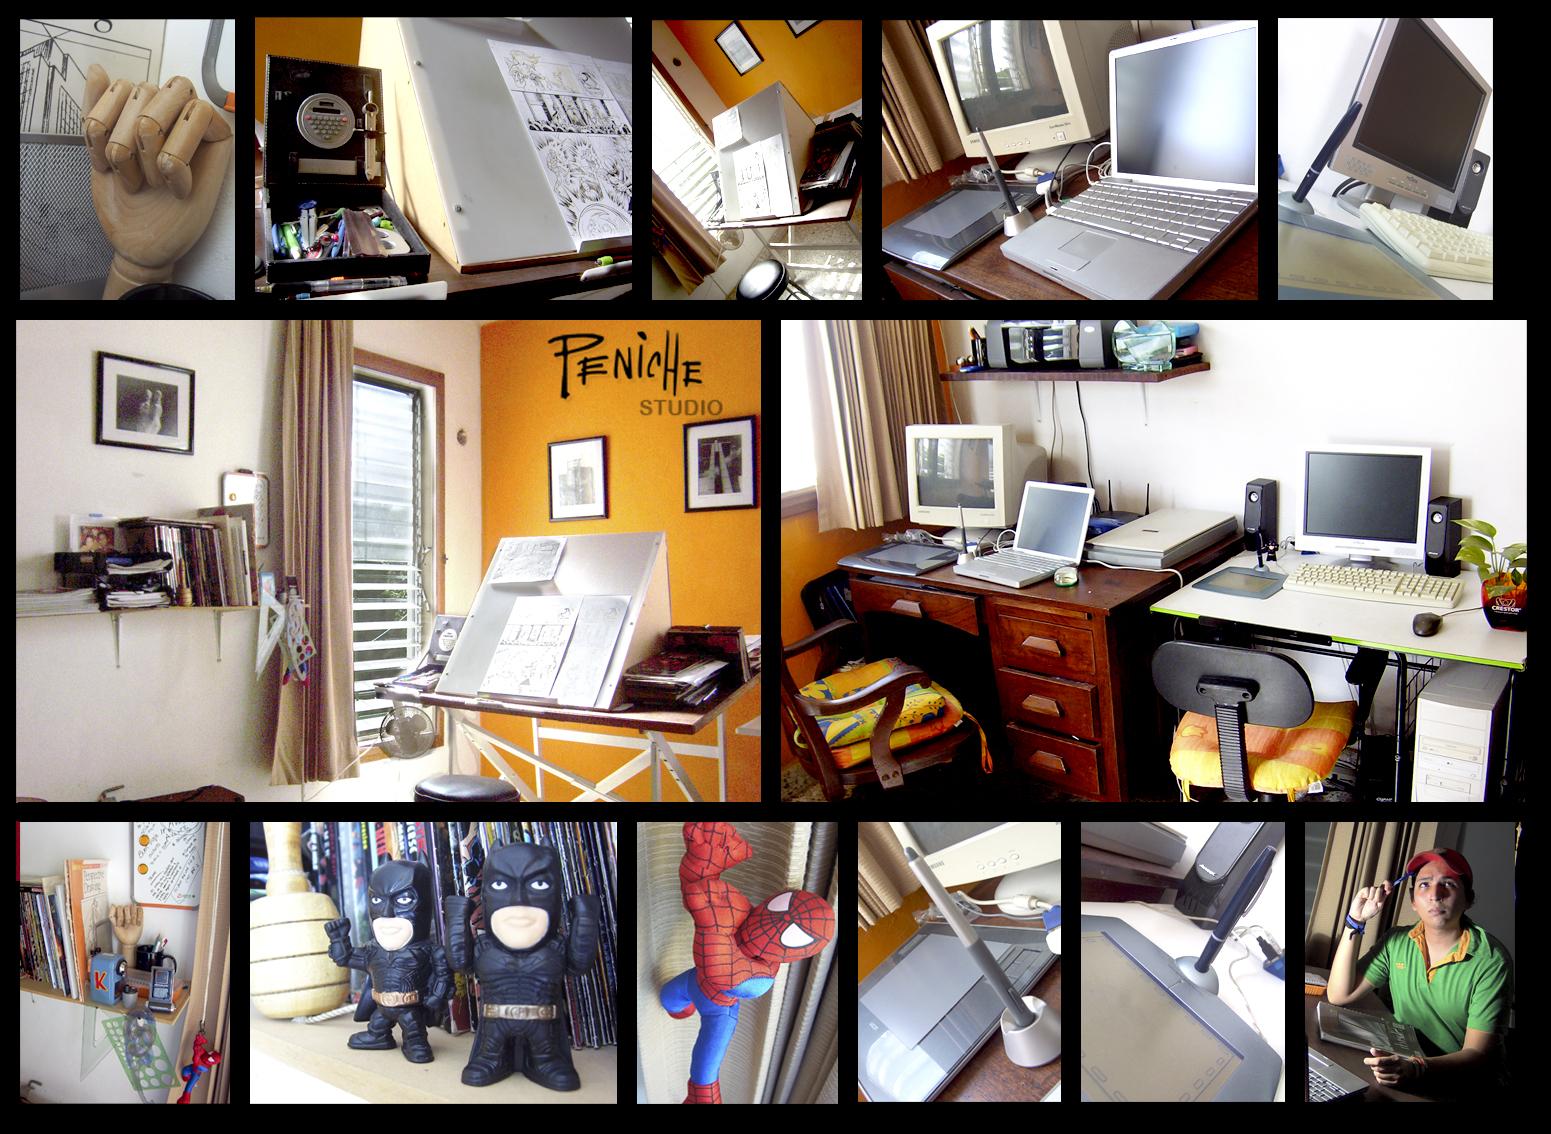 My Studio by Fpeniche